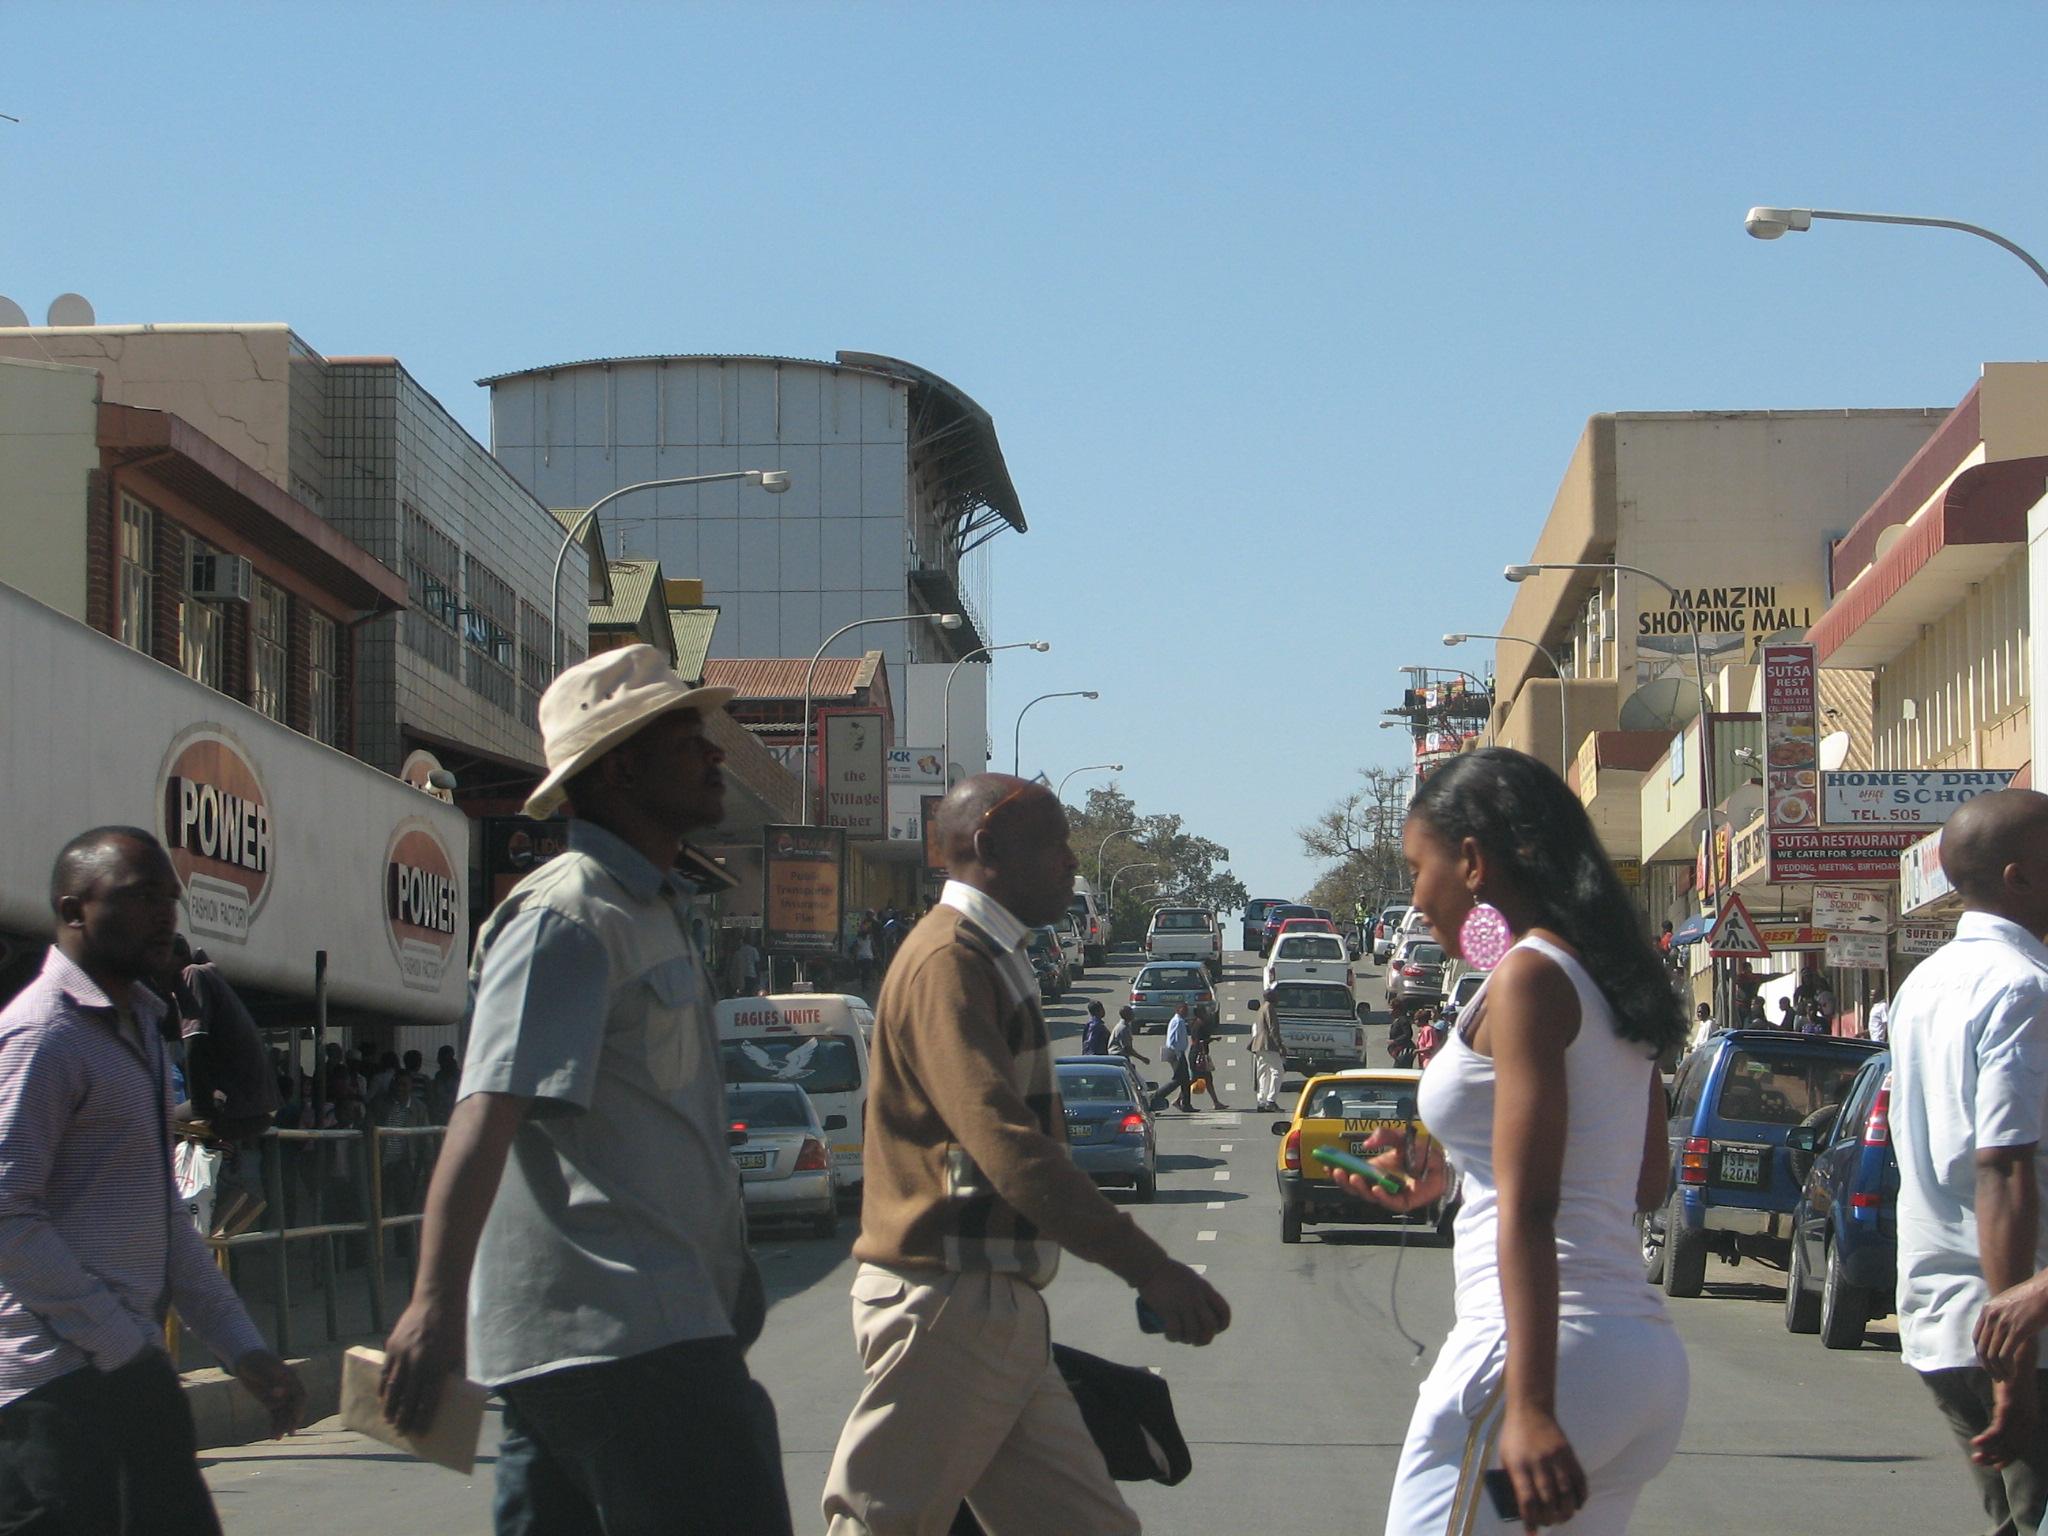 Manzini City